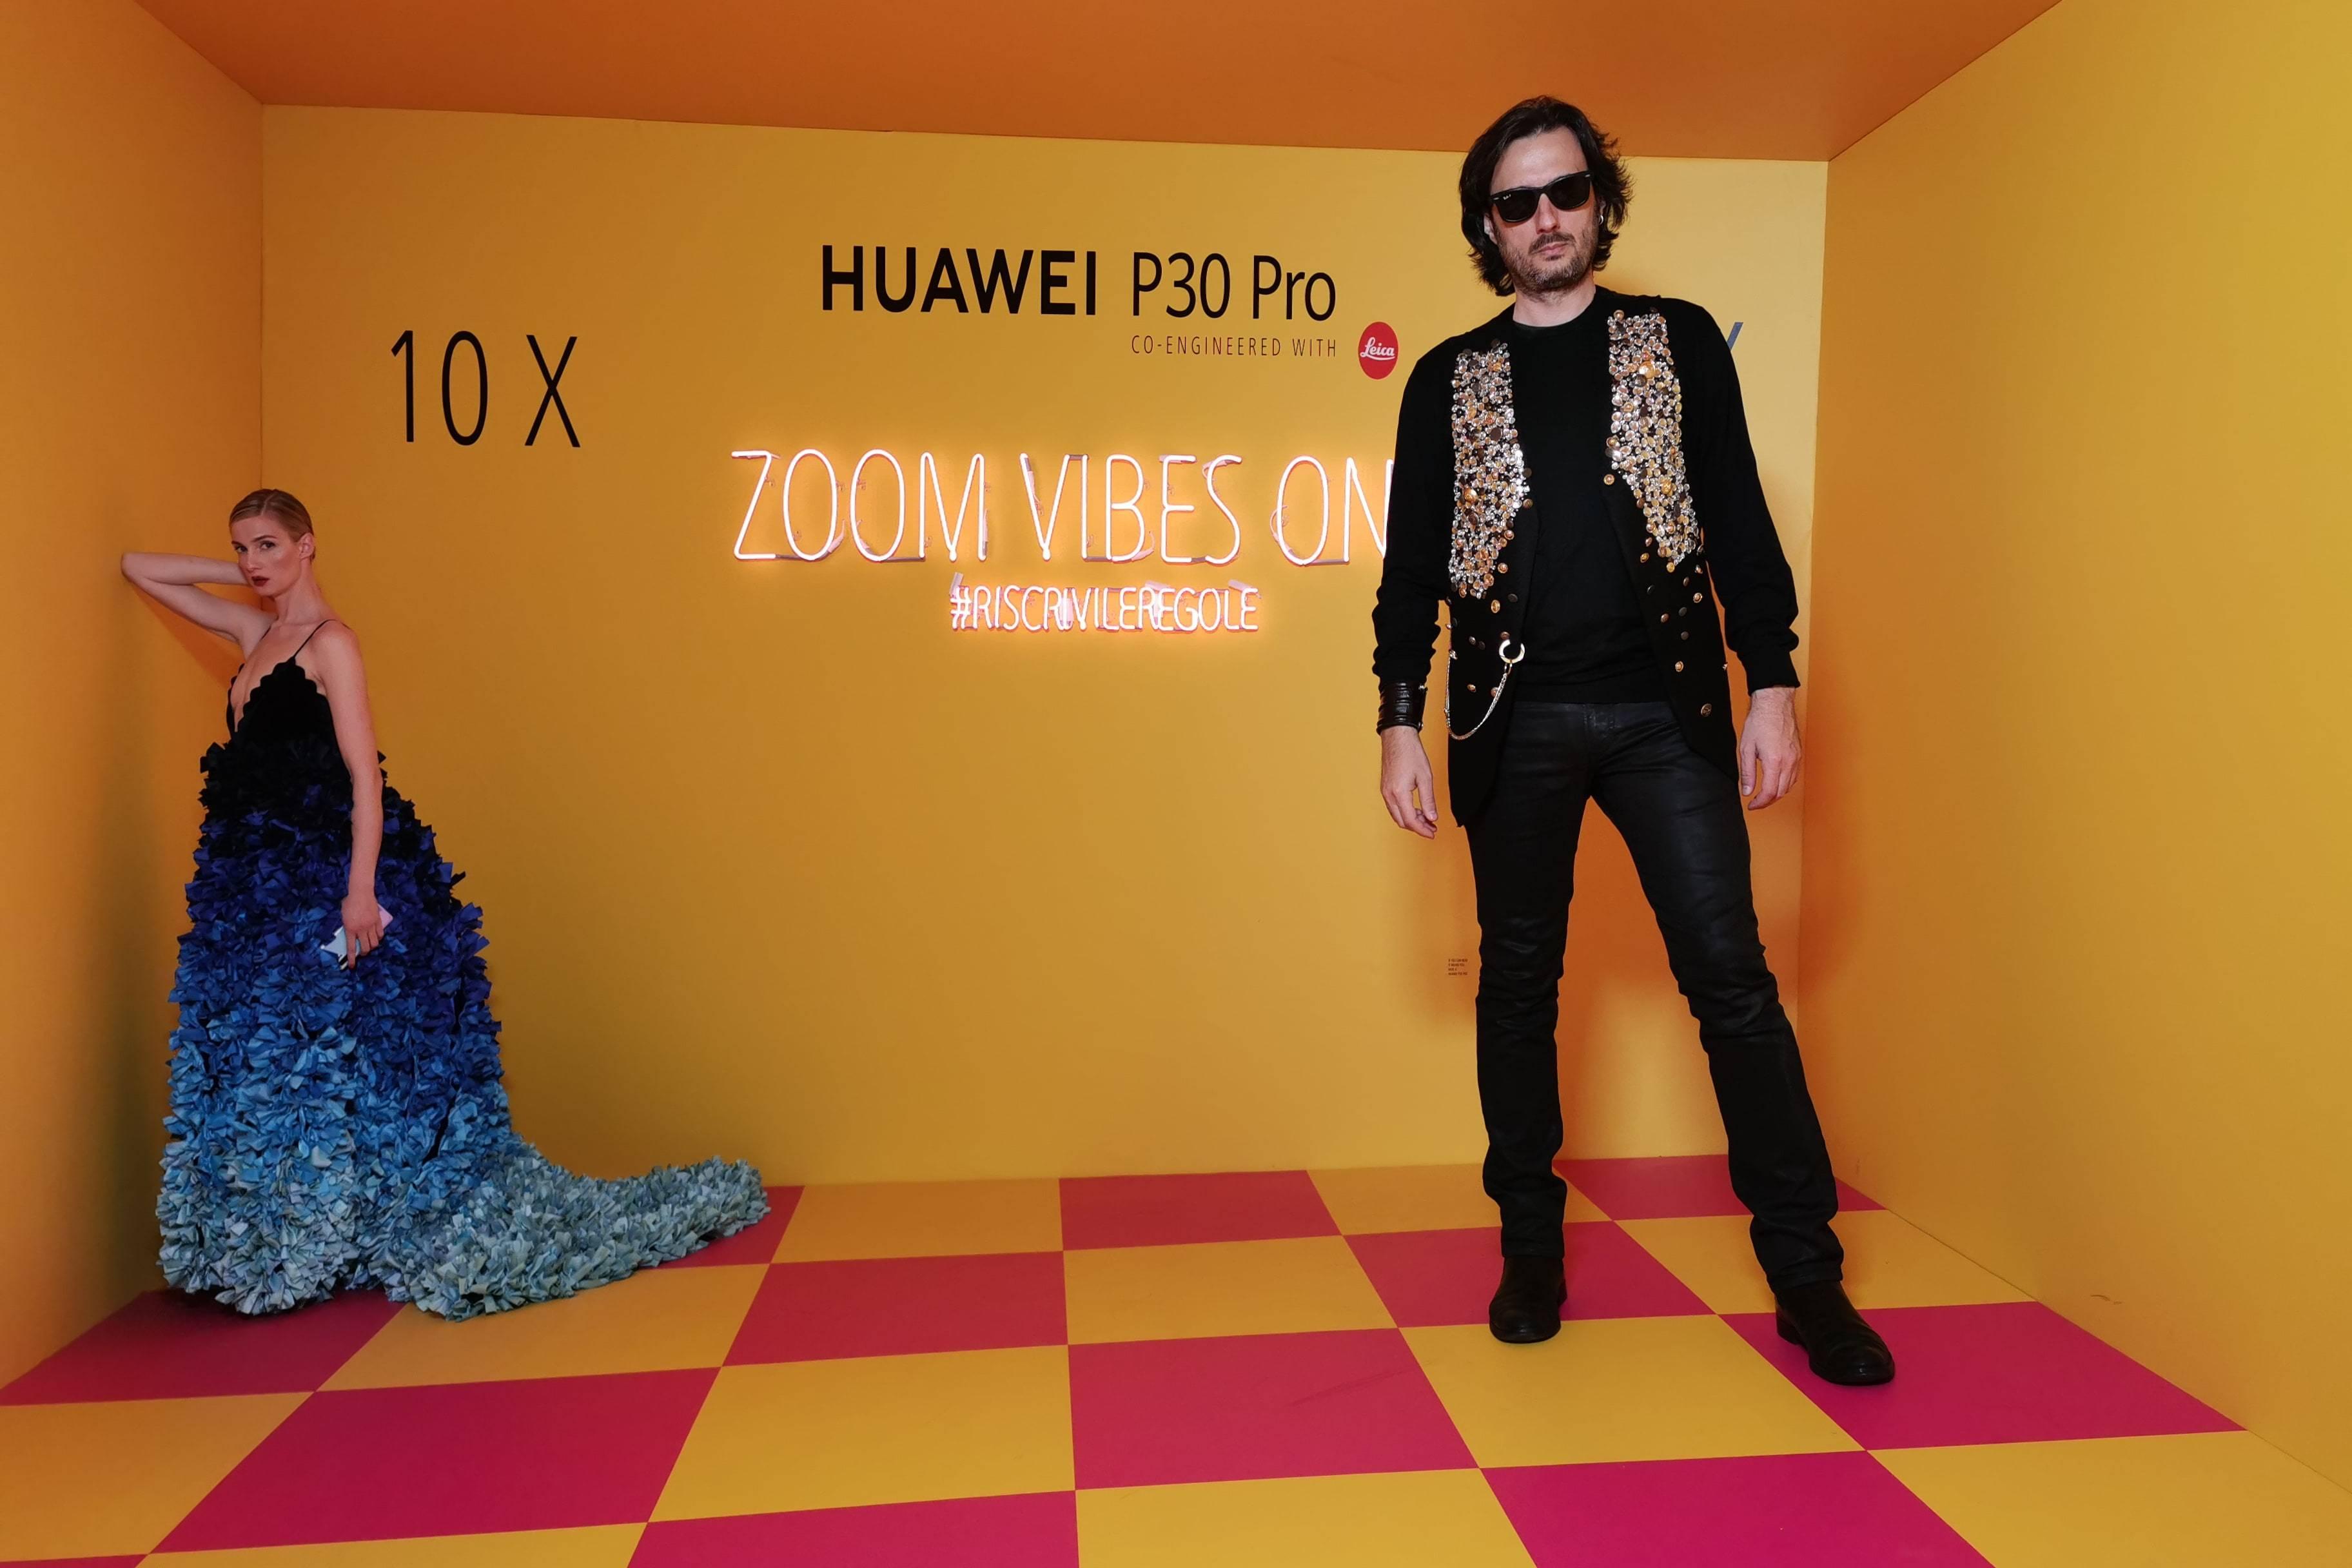 Huawei p 30 pro zoom vibe on